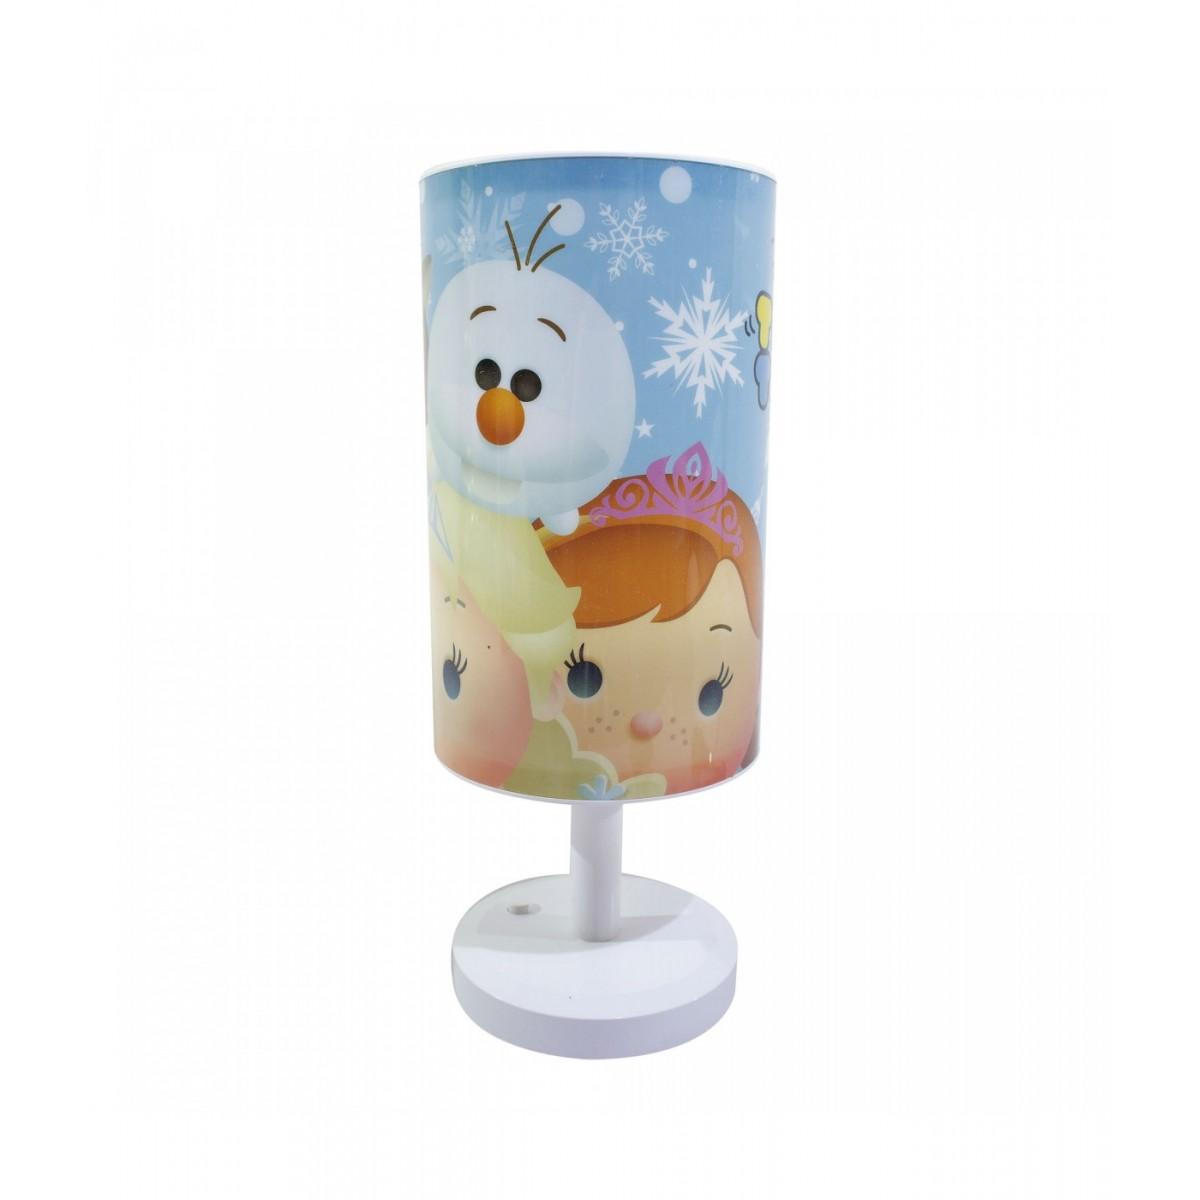 Abajur Luminária de Mesa Disney Tsum Tsum Frozen Anna, Elsa, Olaf